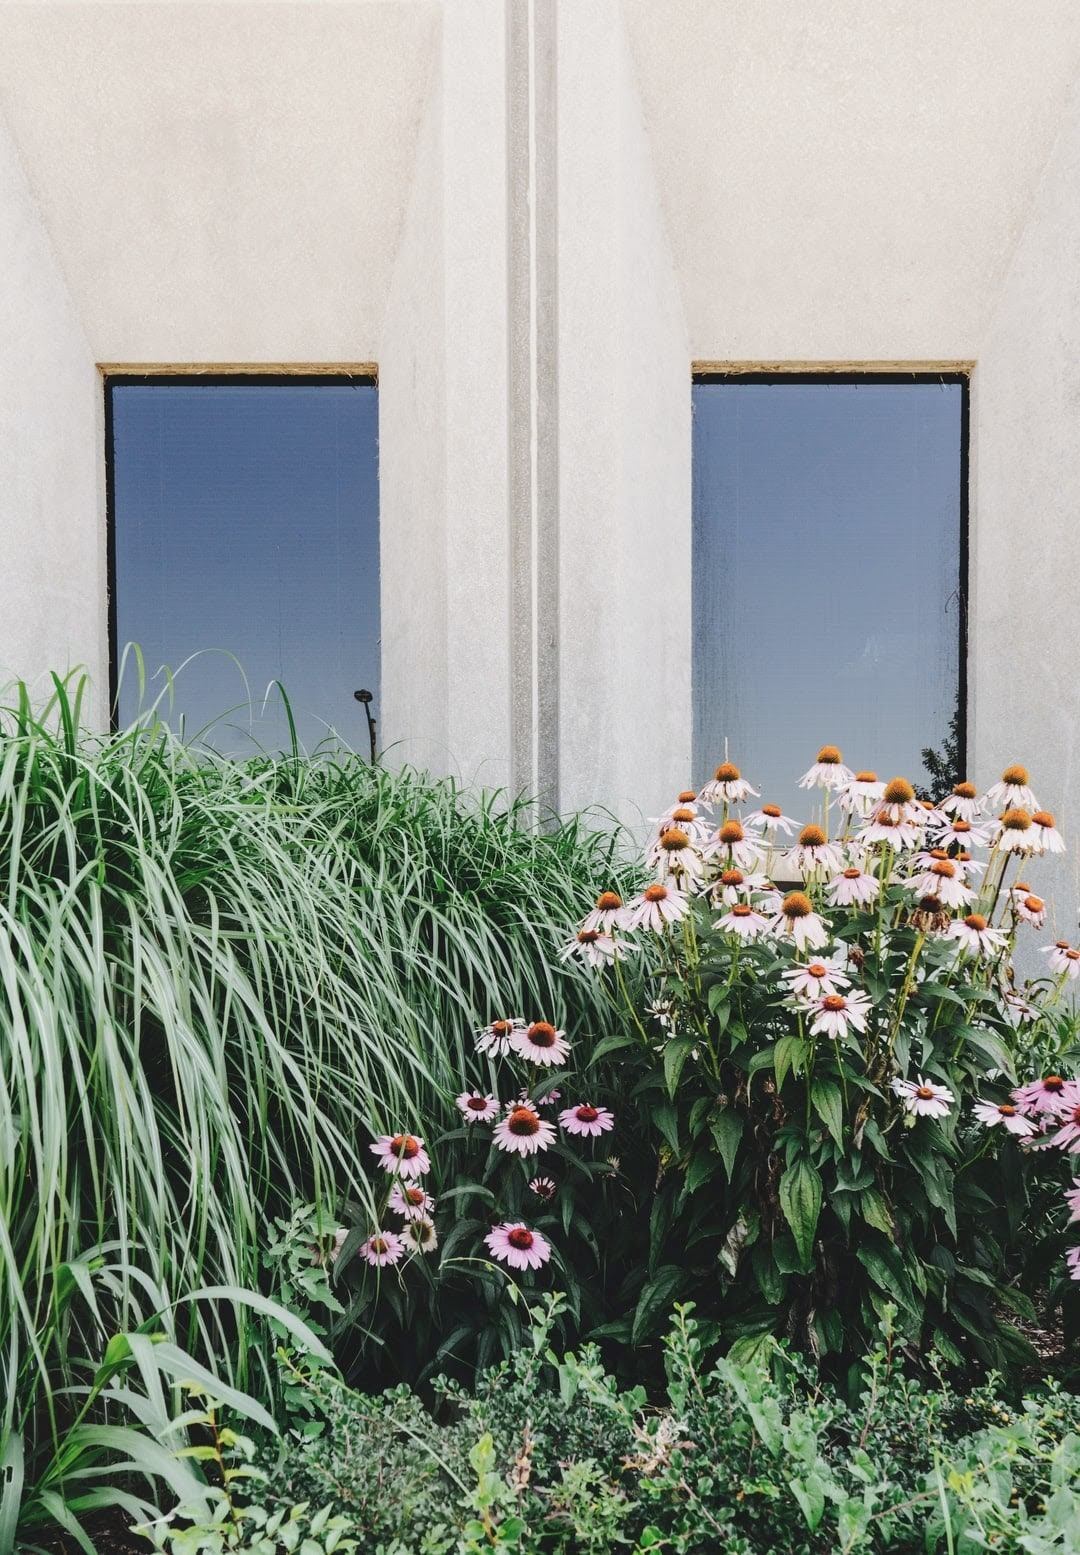 garden design consultation sydney